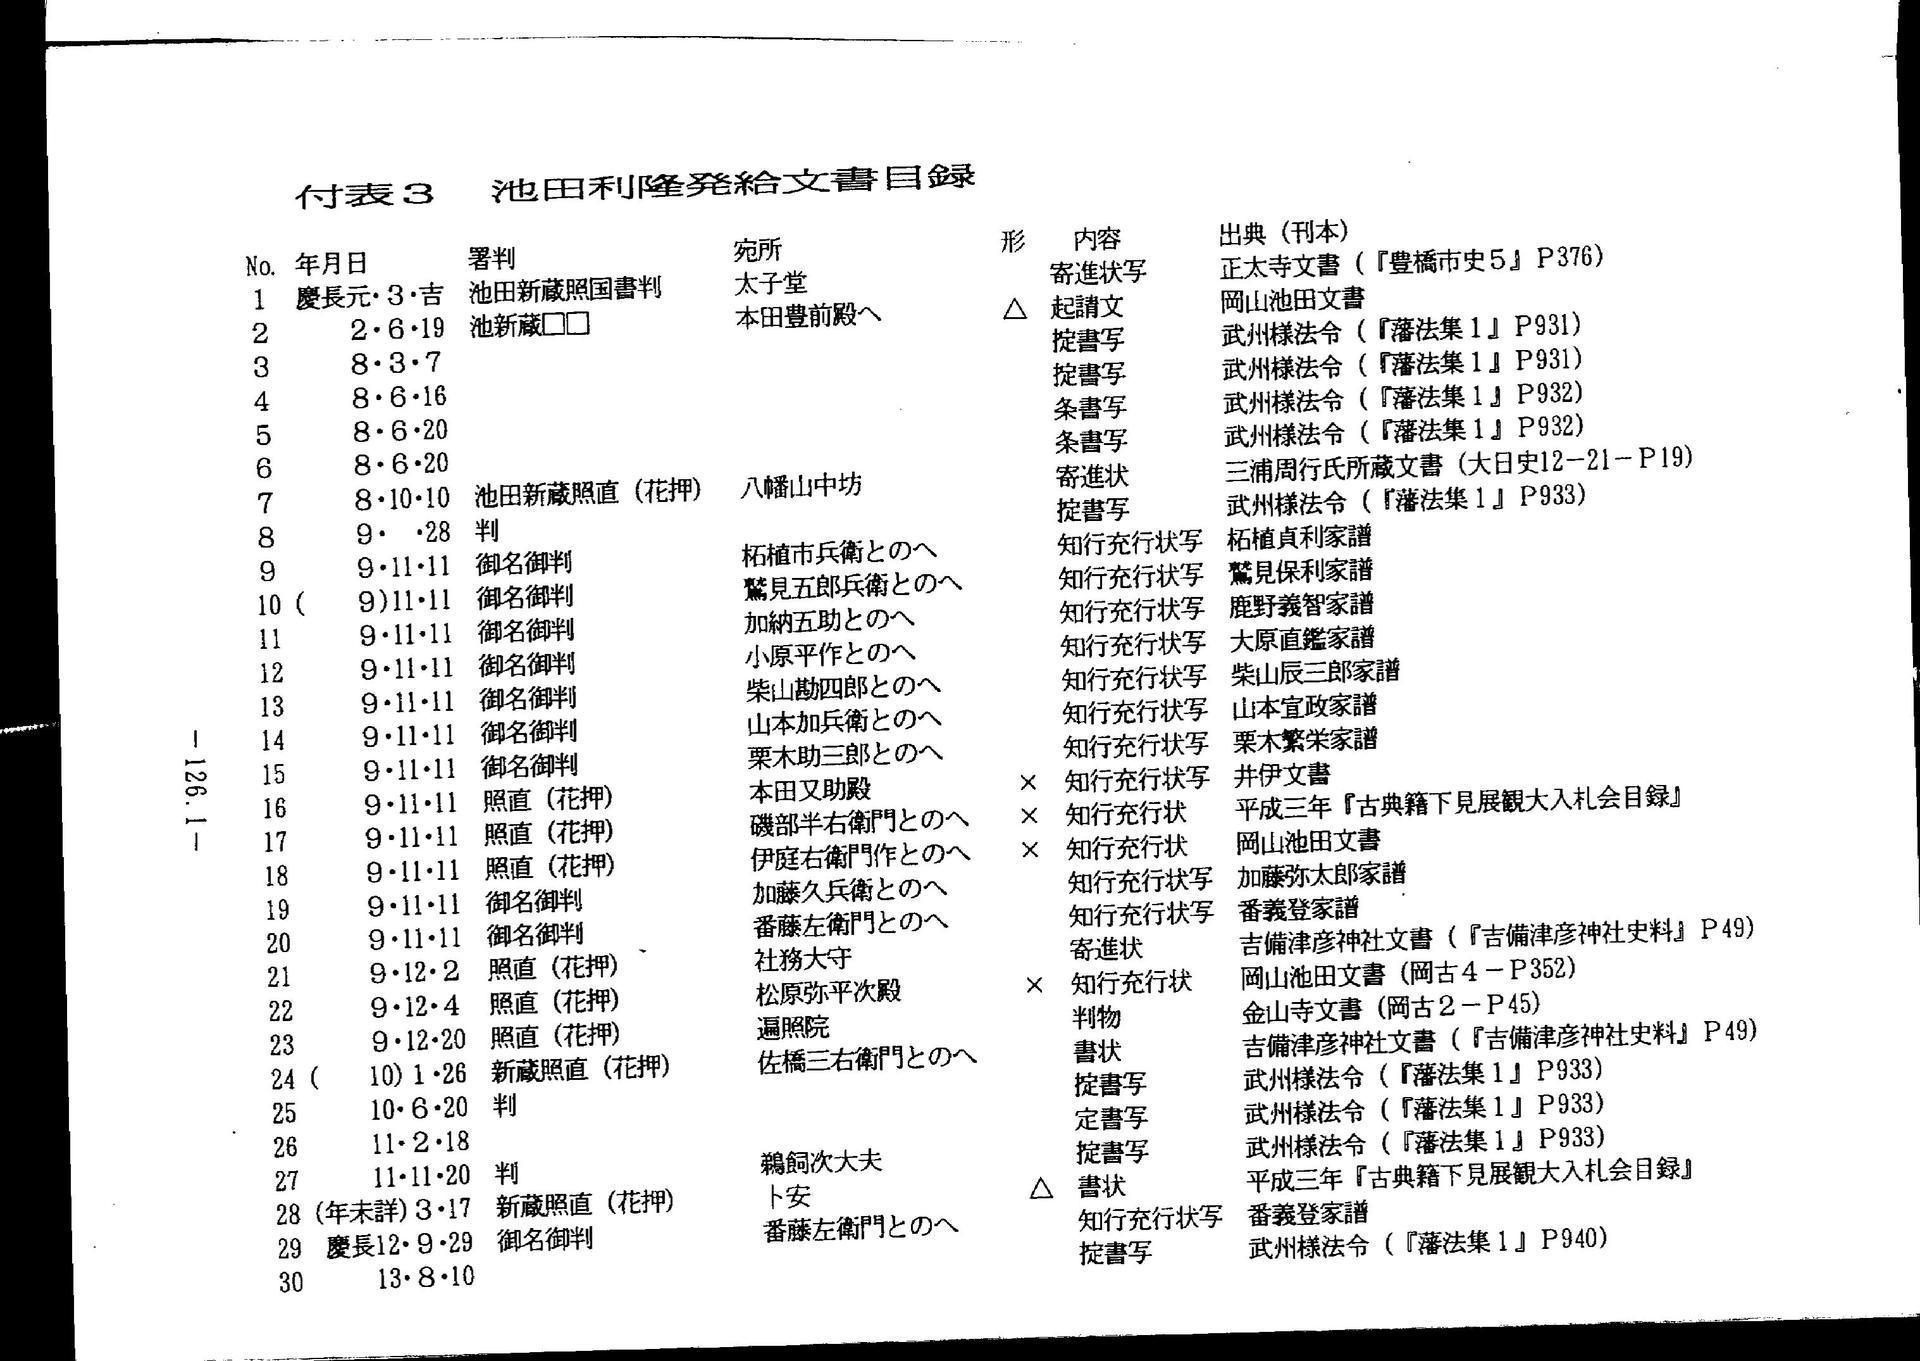 岡山藩の支配方法と社会構造補遺...